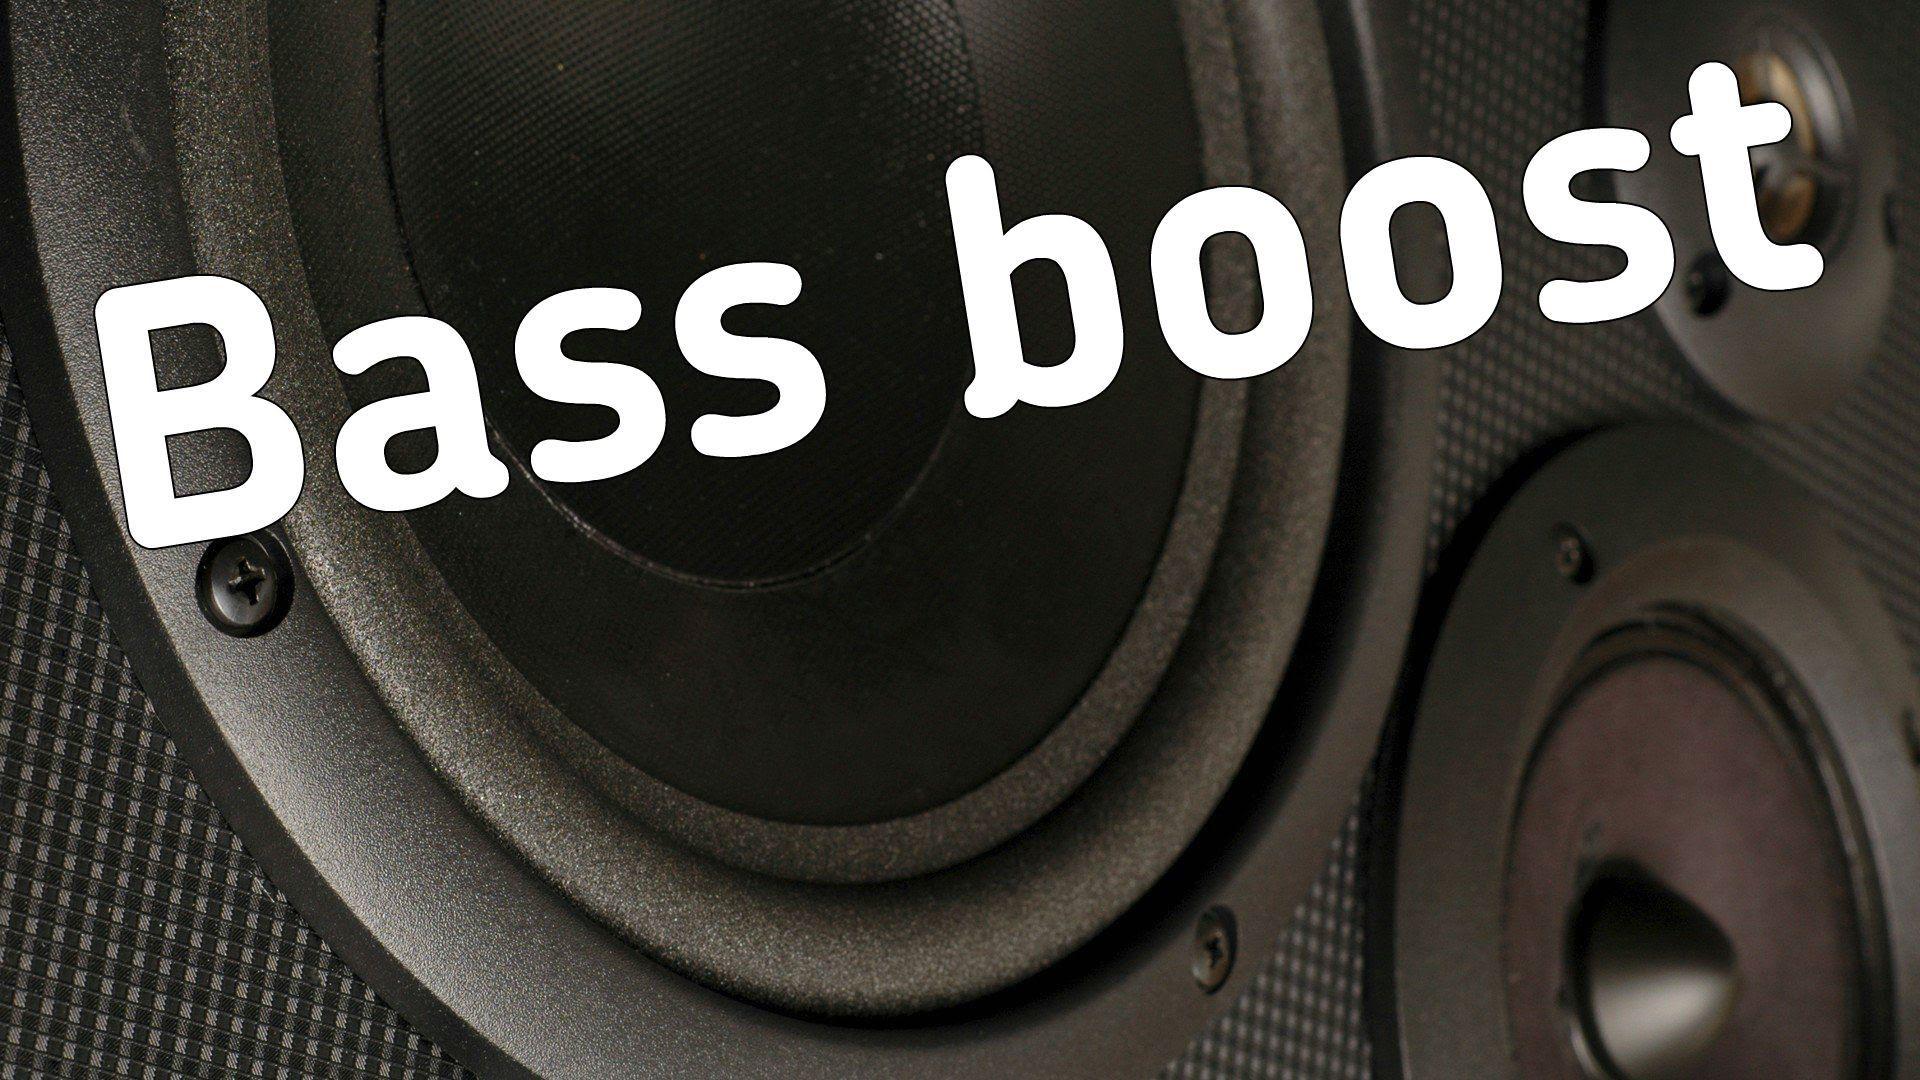 New Dance Club Mix Bass Boosted House Music Techno Bdm Remix Bingo